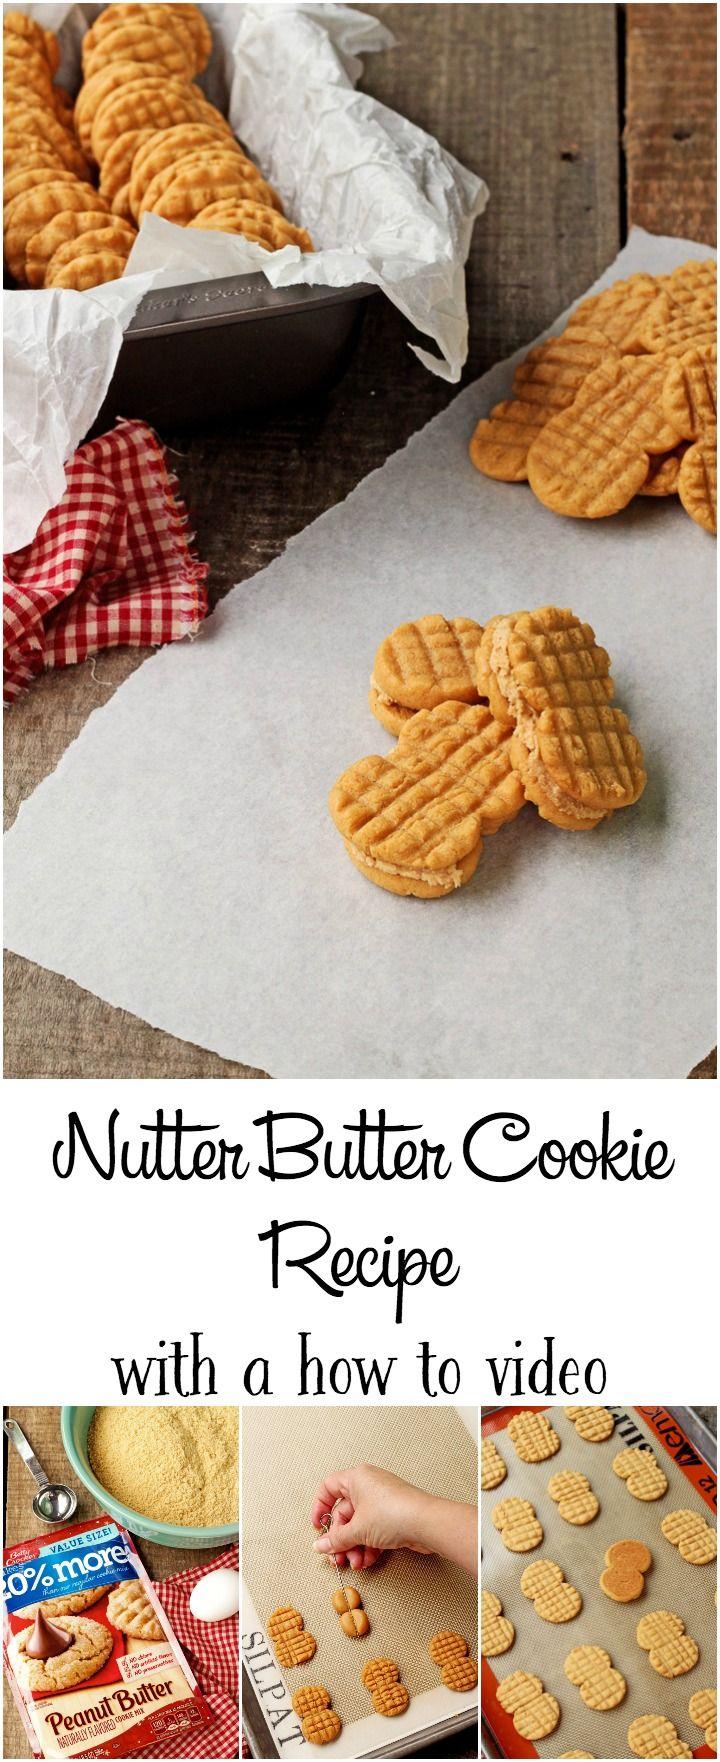 Baker cookies recipes